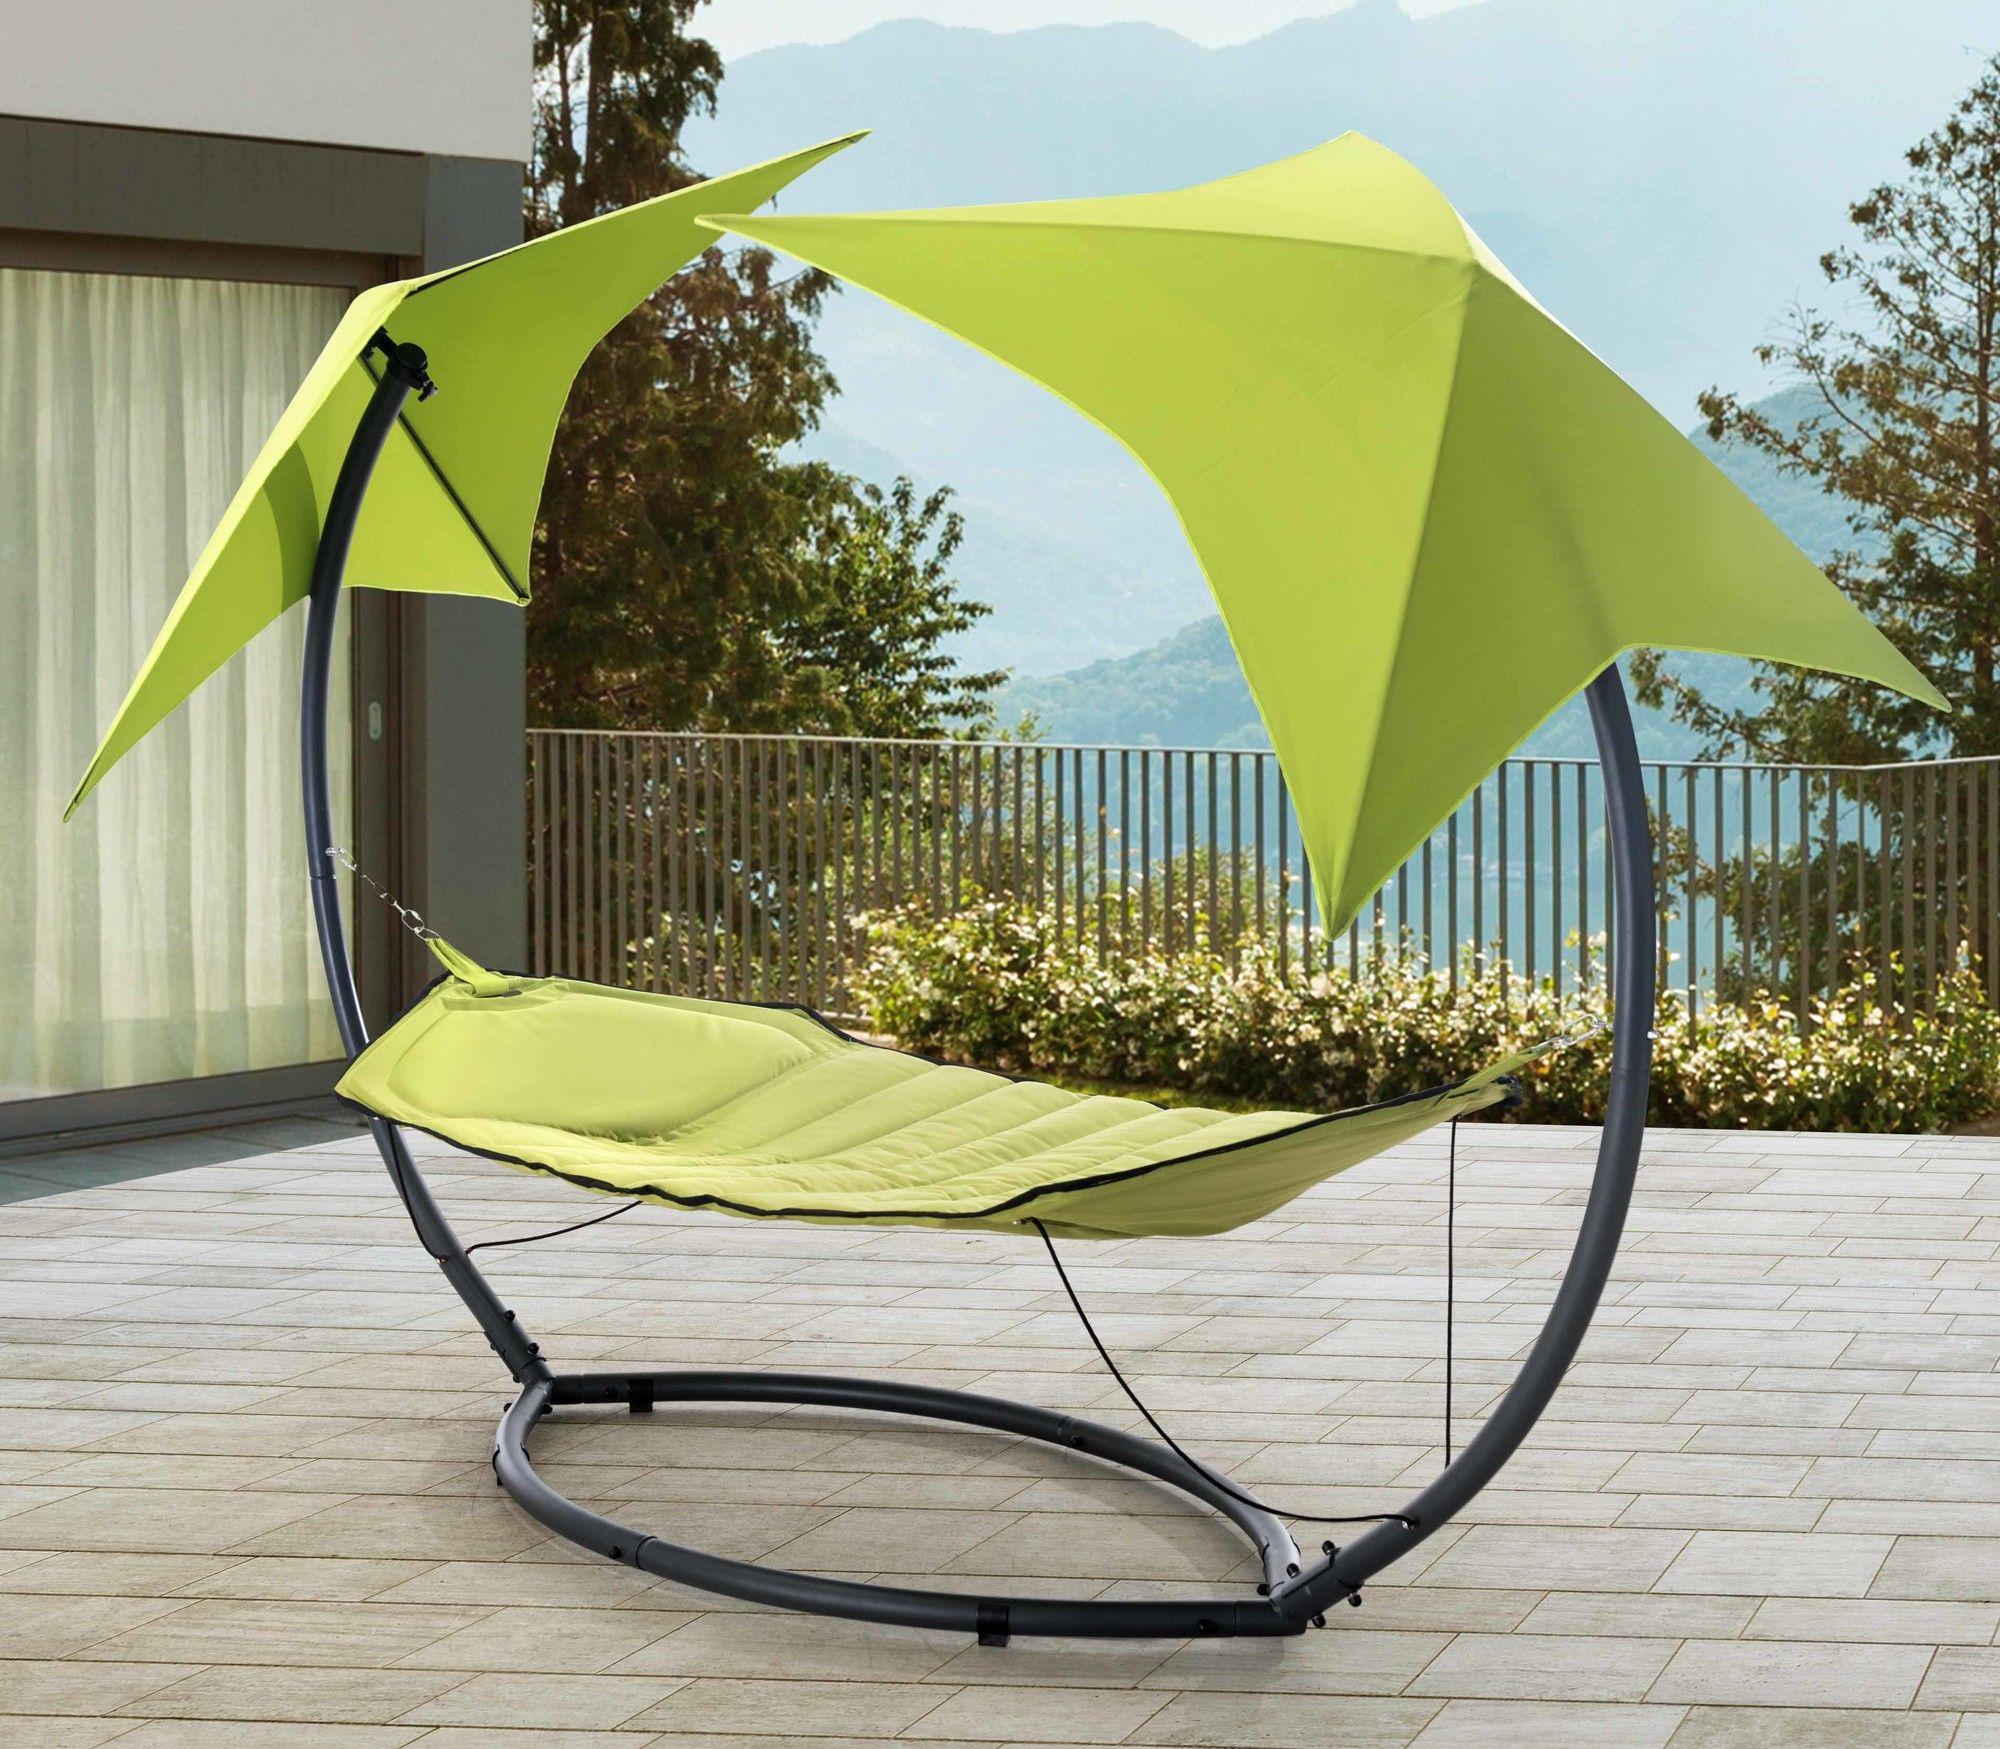 tulum best smsender garden chair hammock master co buy porch swing